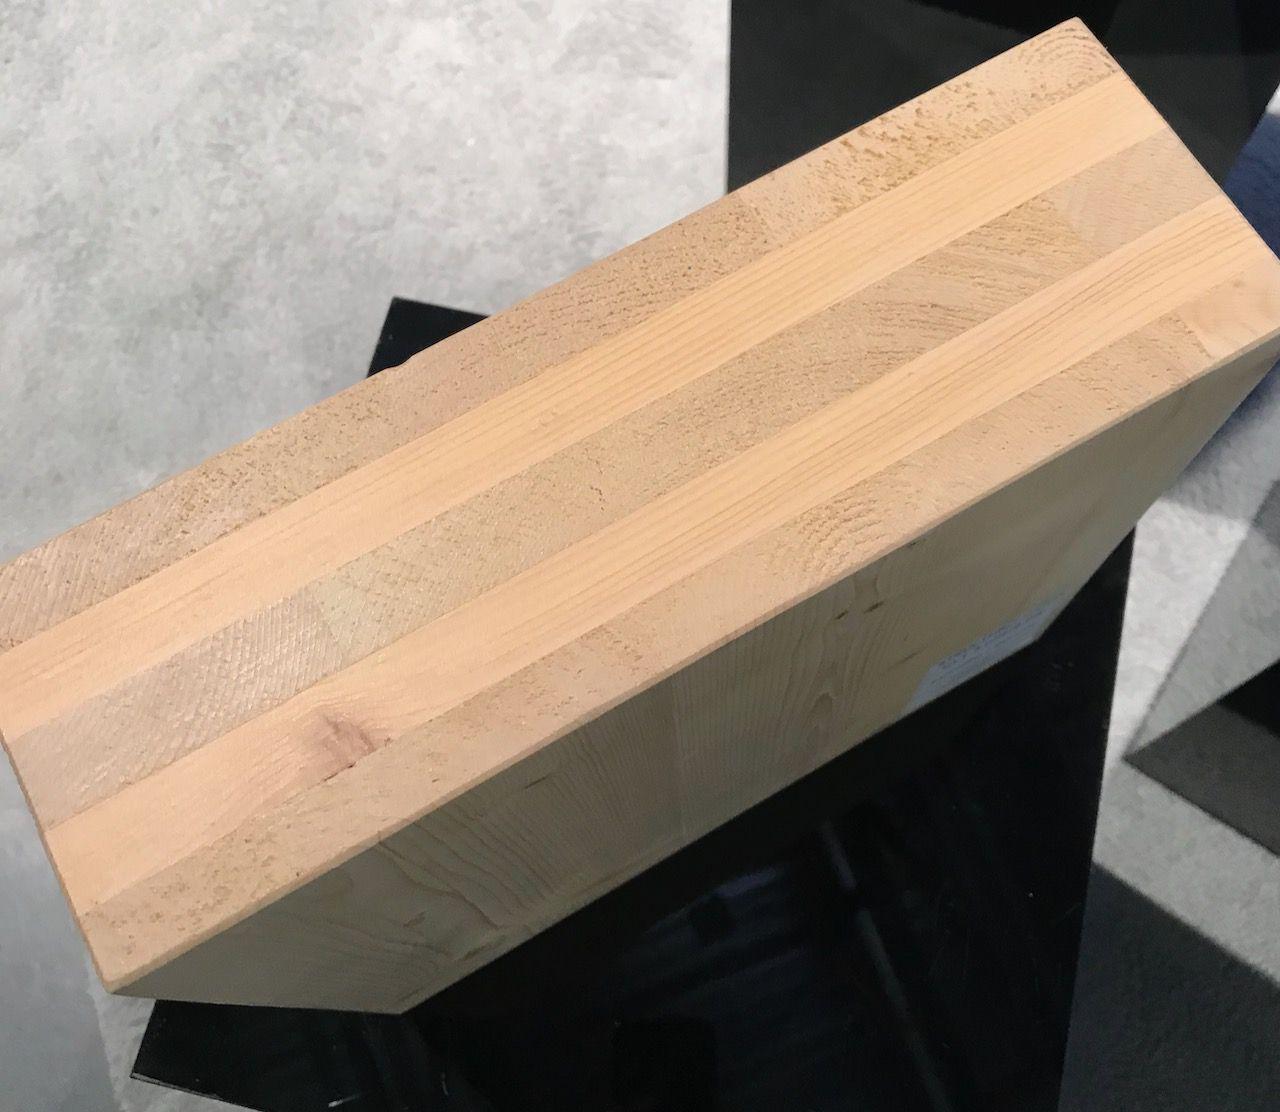 Block of cross laminated timber